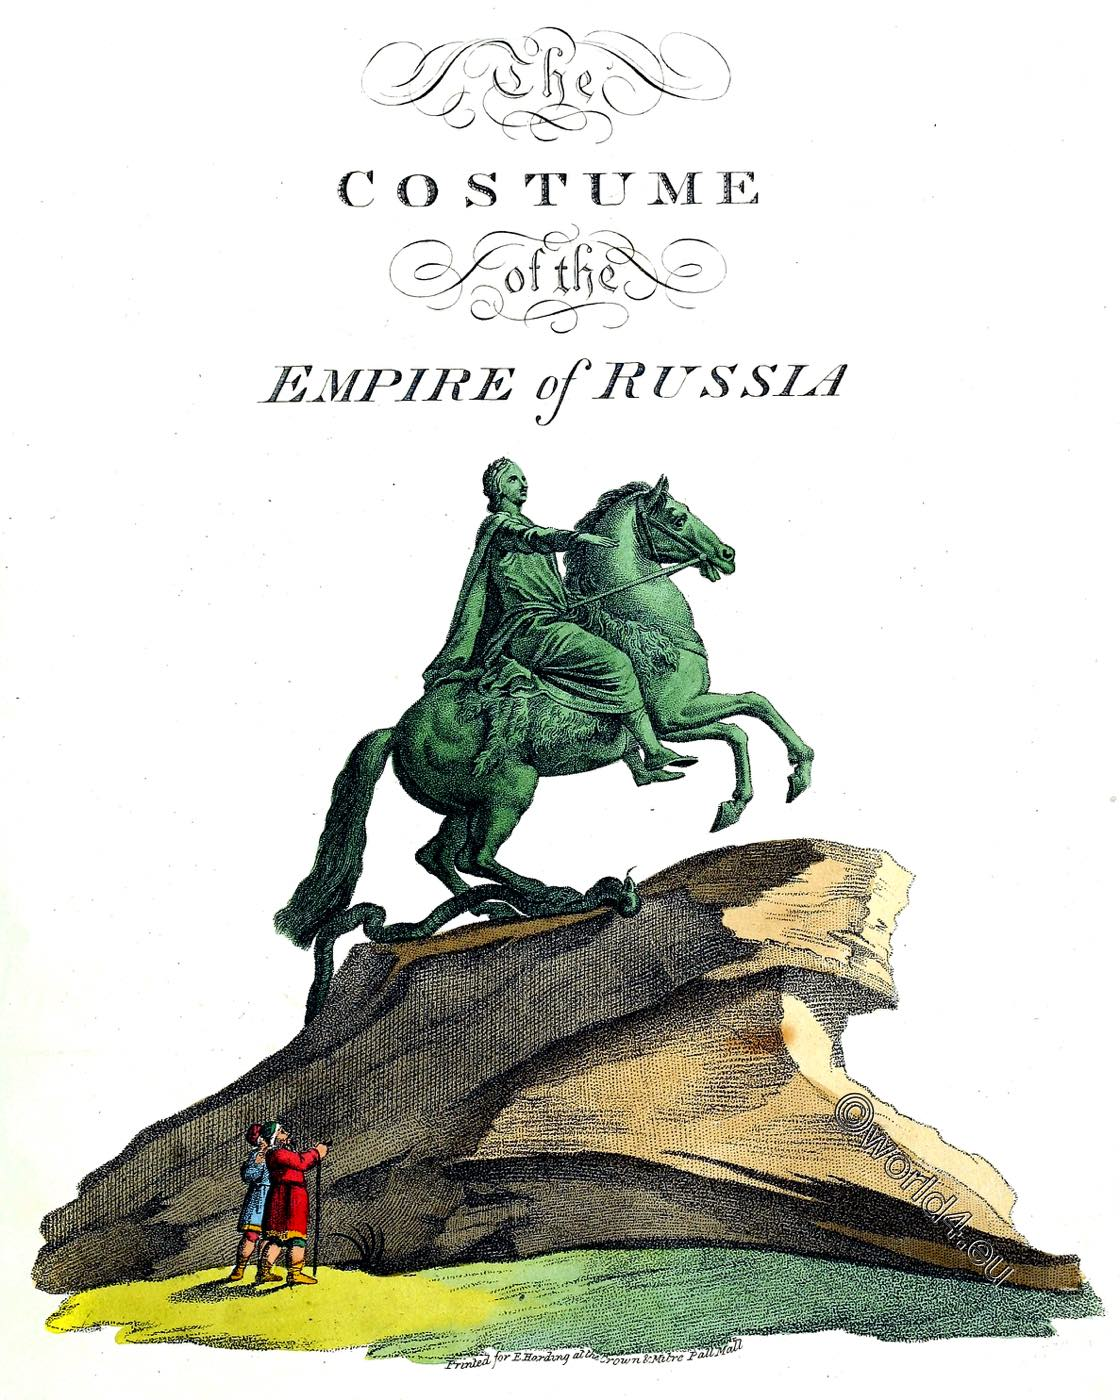 Edward Harding, Costume, Russian, empire,